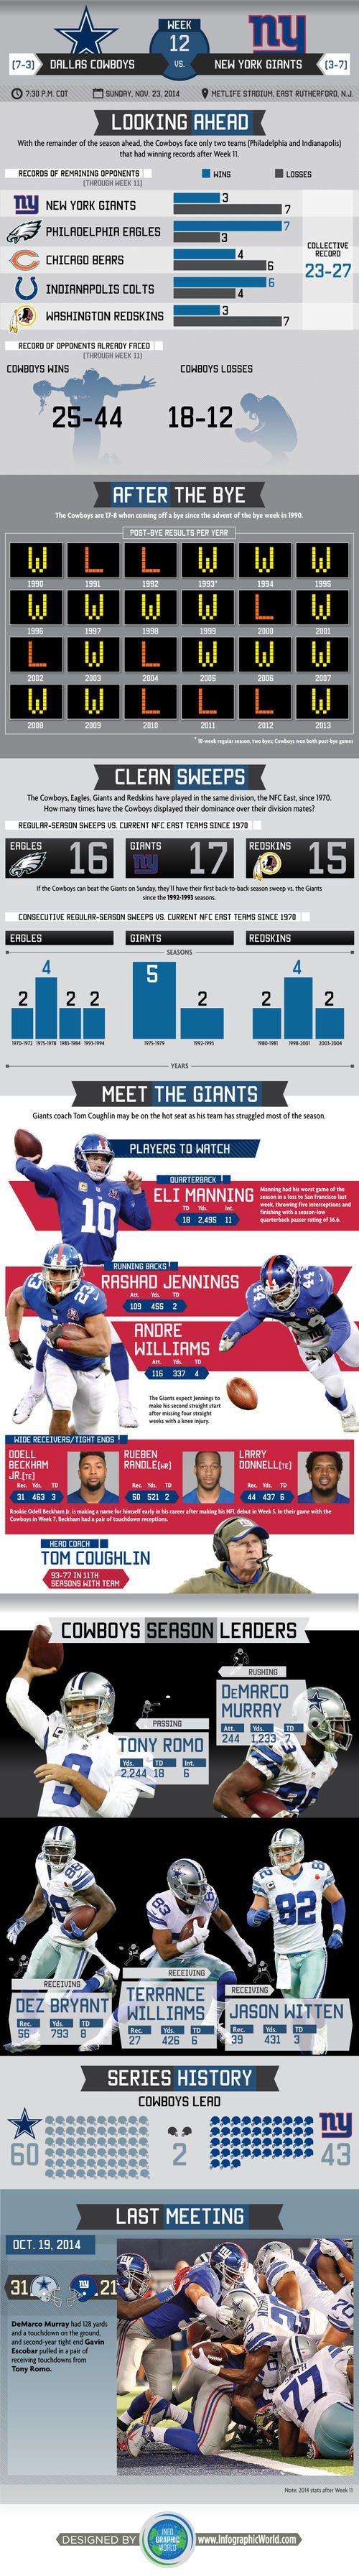 Infographic: Historical Bye-Week Statistics; NYG Offensive Leaders #DallasCowboys #DALvsNYG